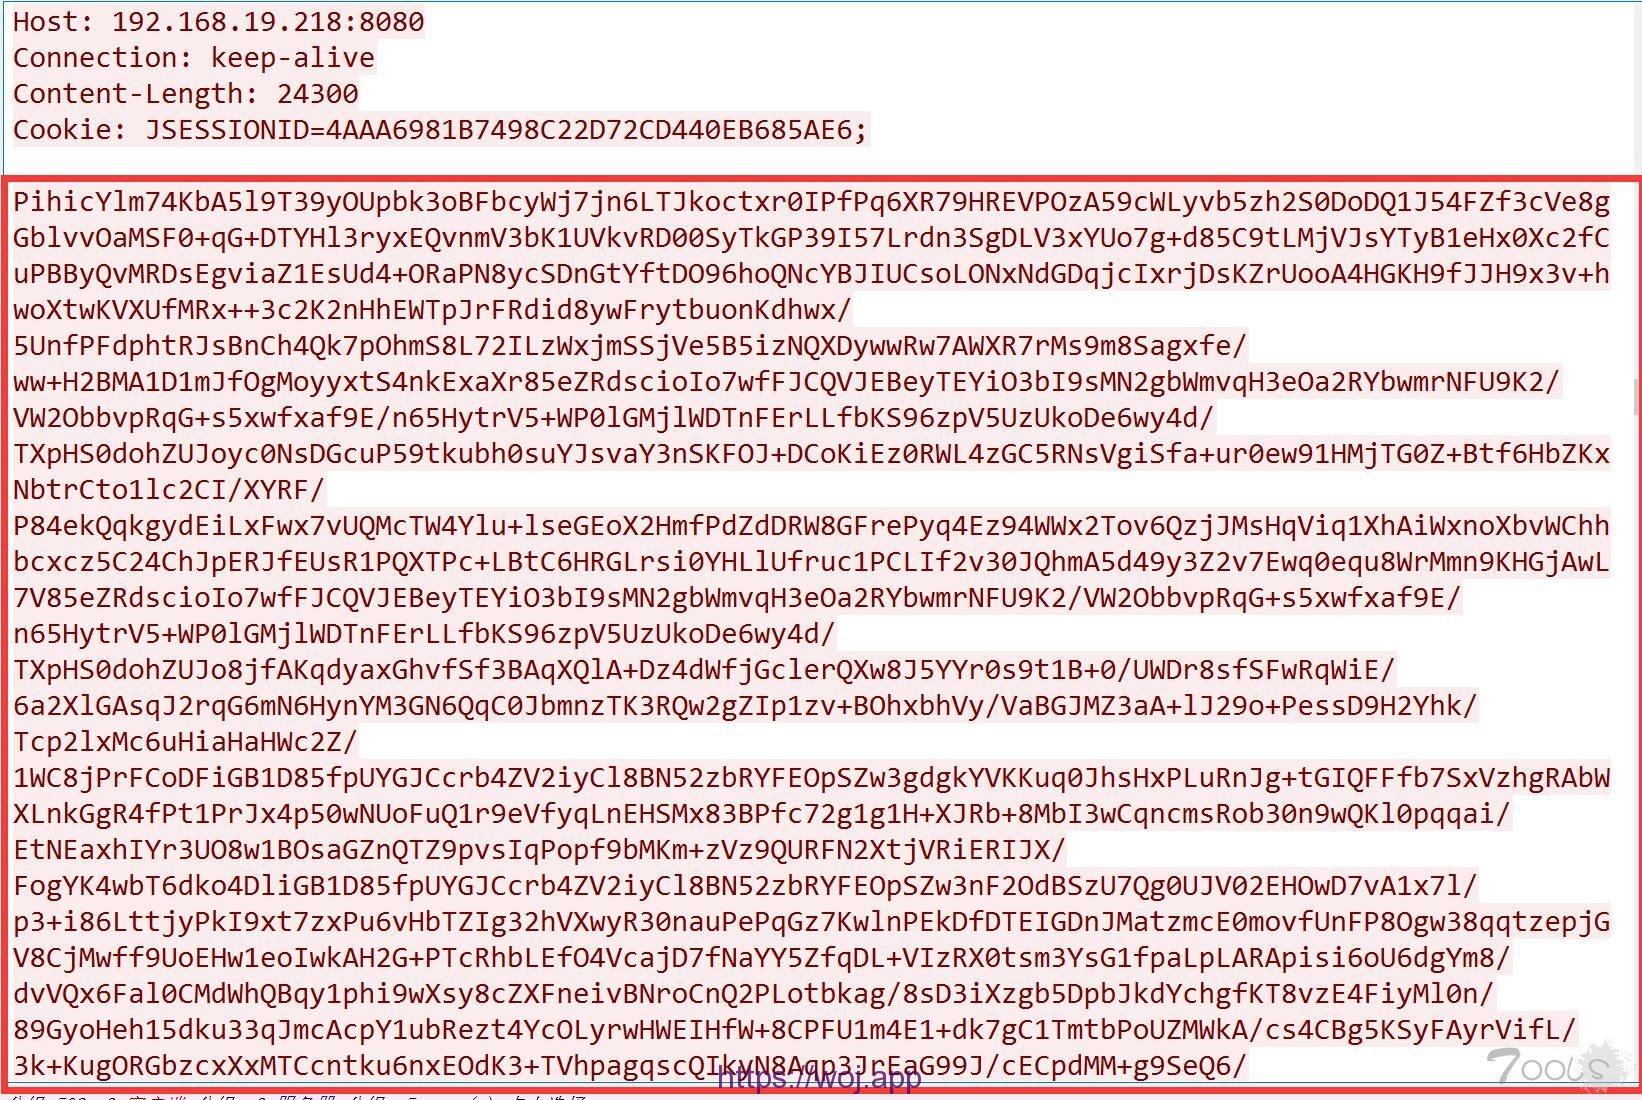 冰蝎POST AES加密内容